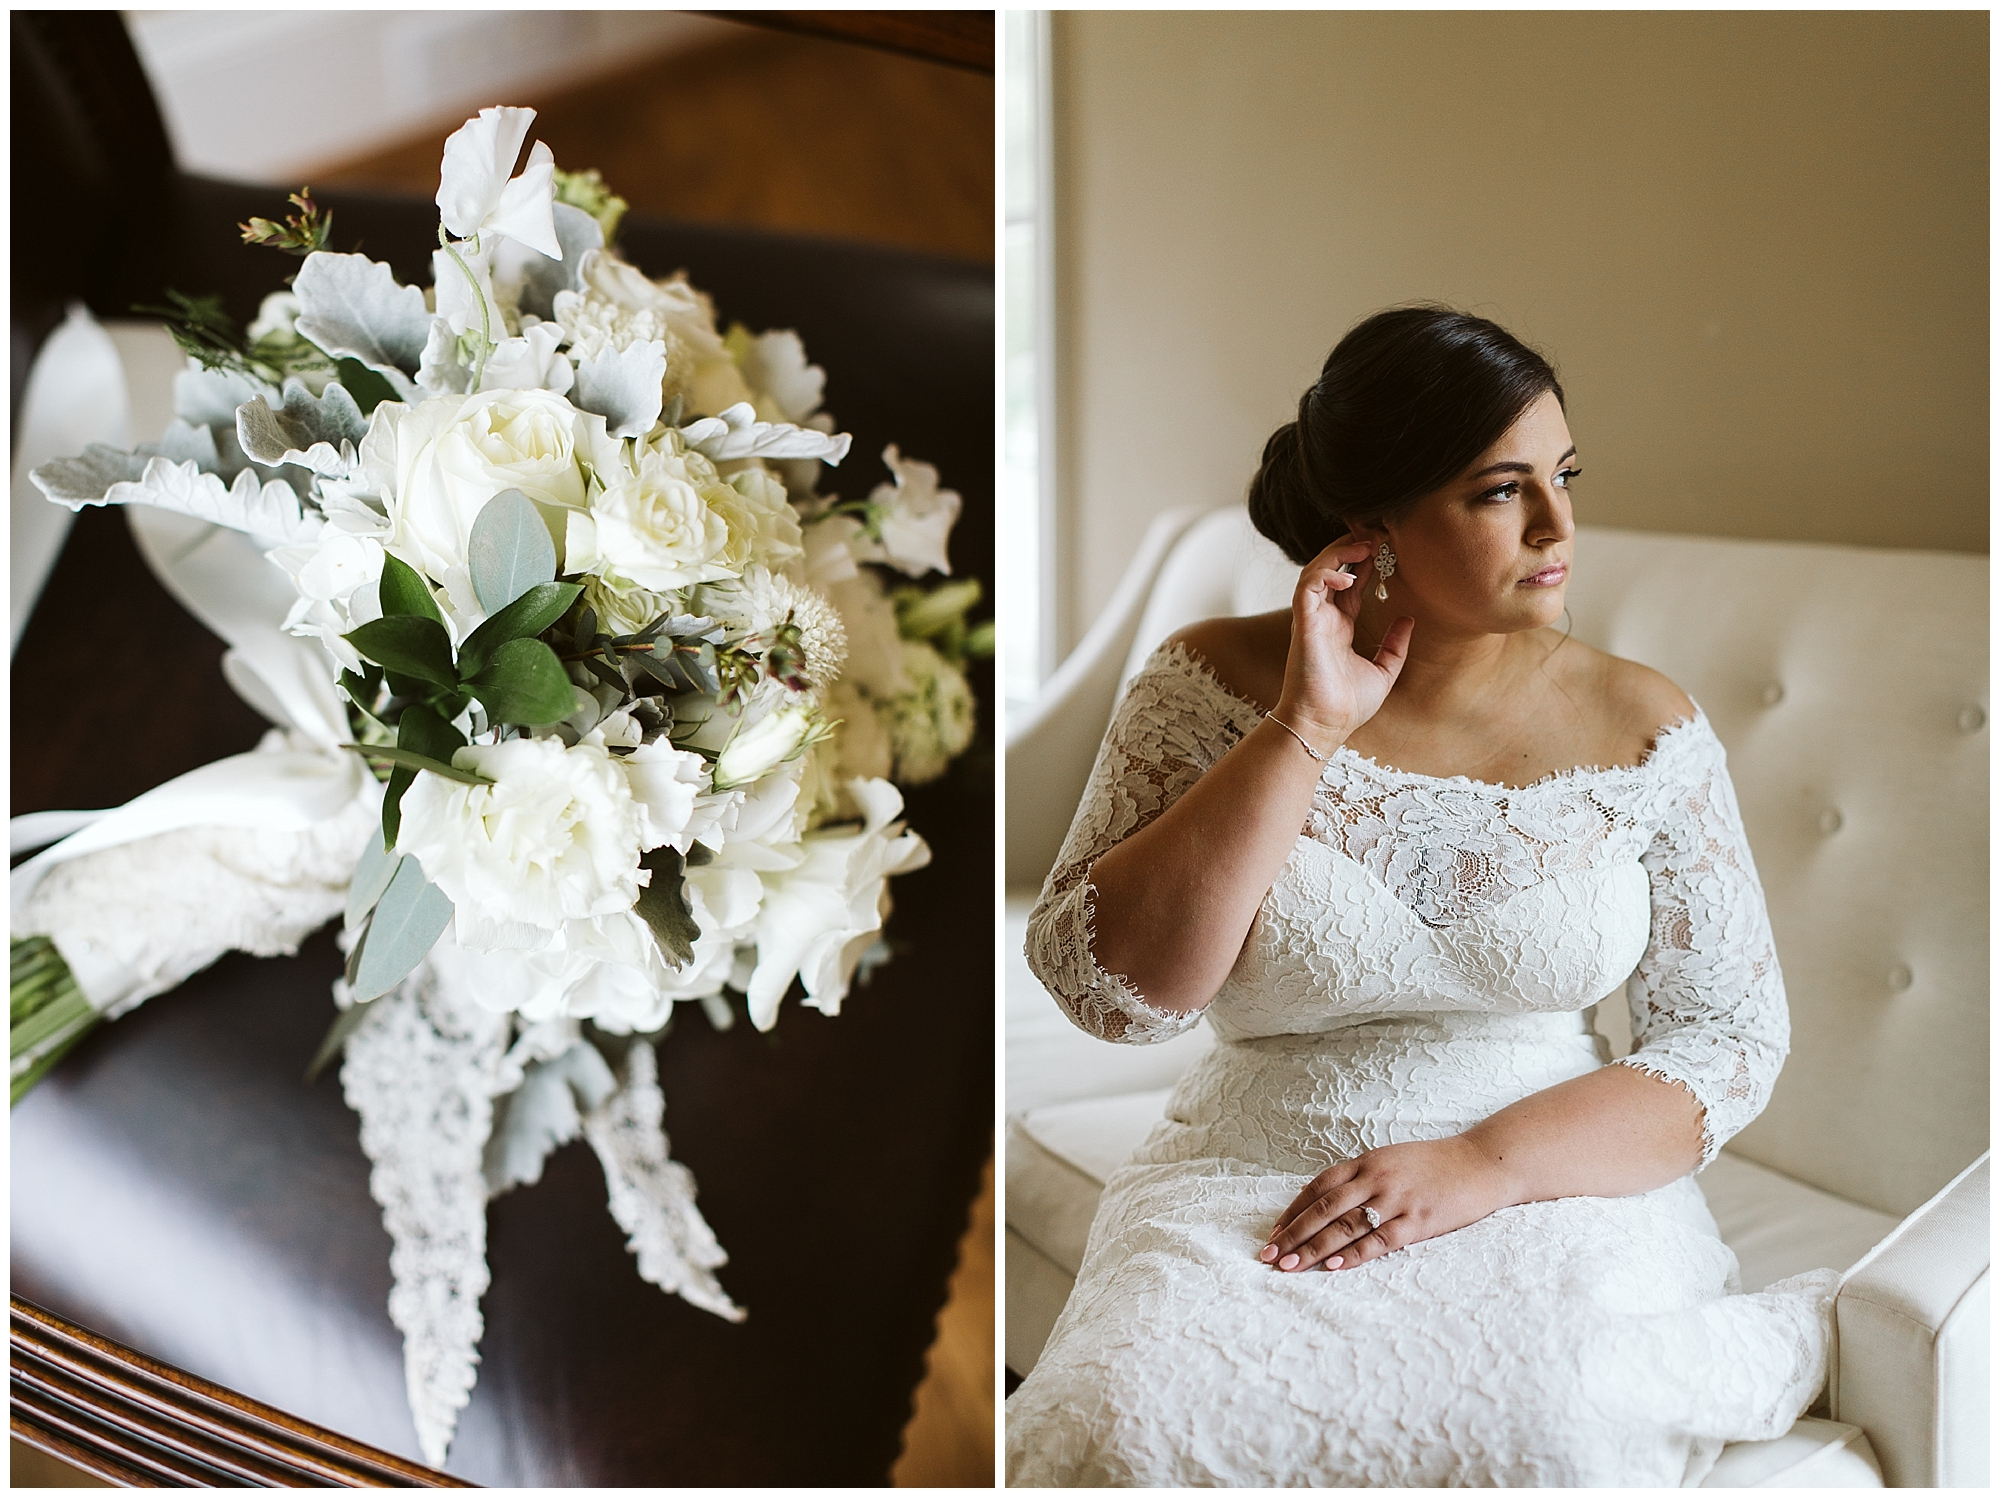 Oaks-at-salem-wedding-apex-photography-11.jpg